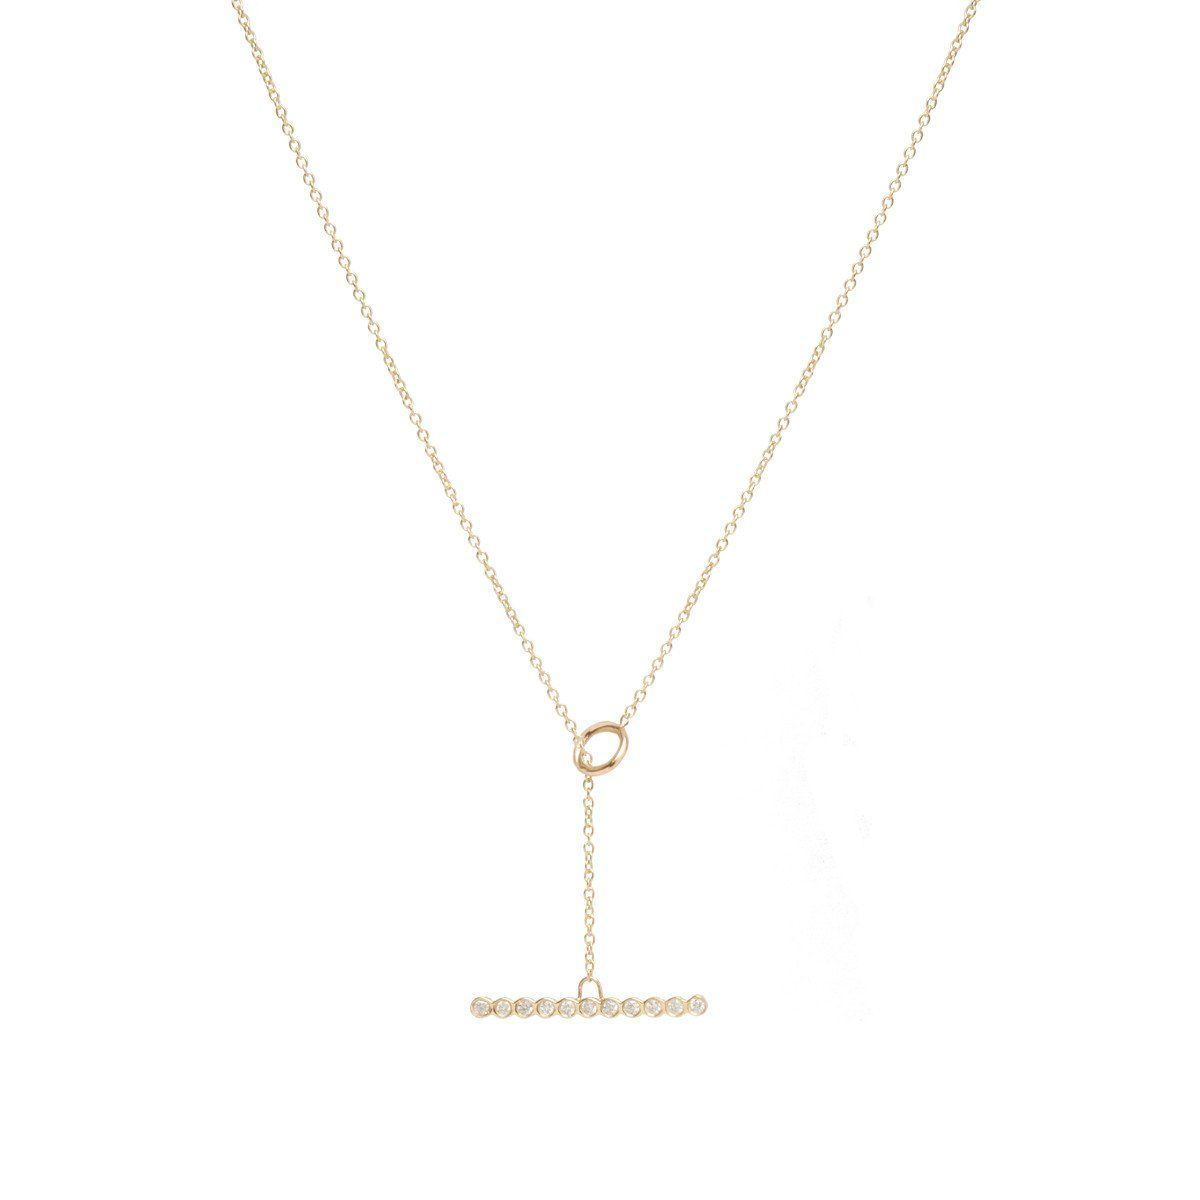 14k Horizontal Diamond Bezel Bar Toggle Necklace Toggle Necklace Bezel Diamond Necklace